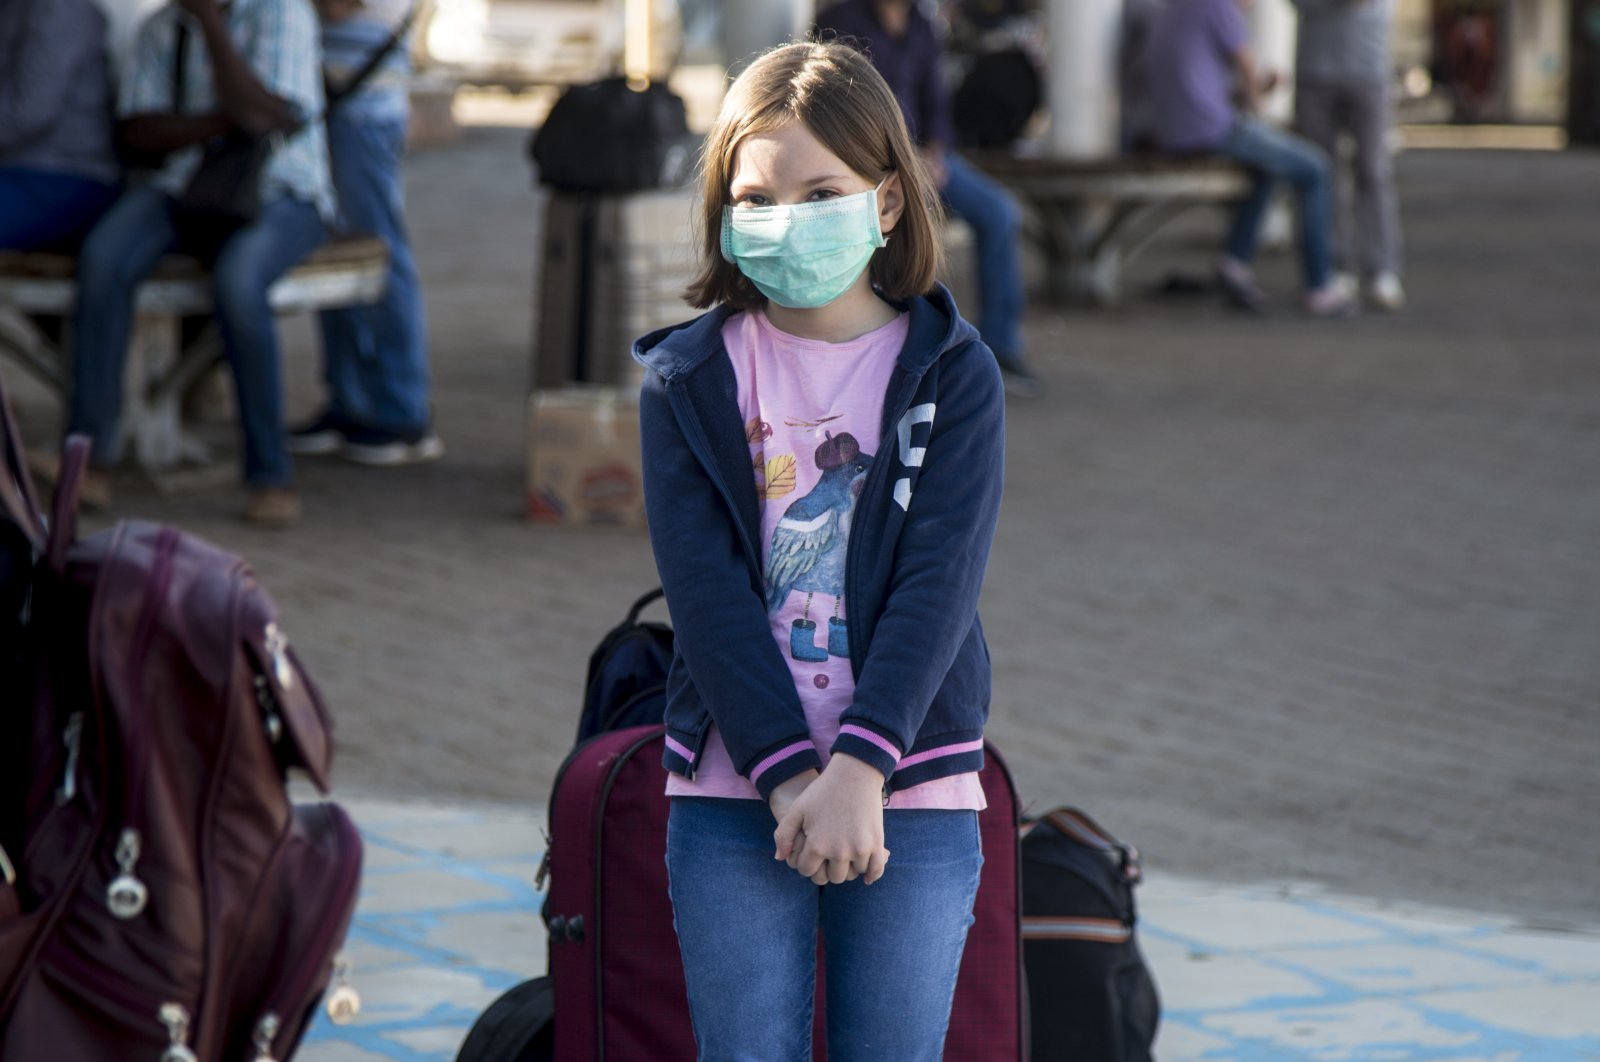 A Turkish girl waits at Khartoum International Airport to board a Turkish Airlines flight as part of Ankara's plan to evacuate its citizens, Khartoum, Sudan, April 22, 2020. (AA Photo)